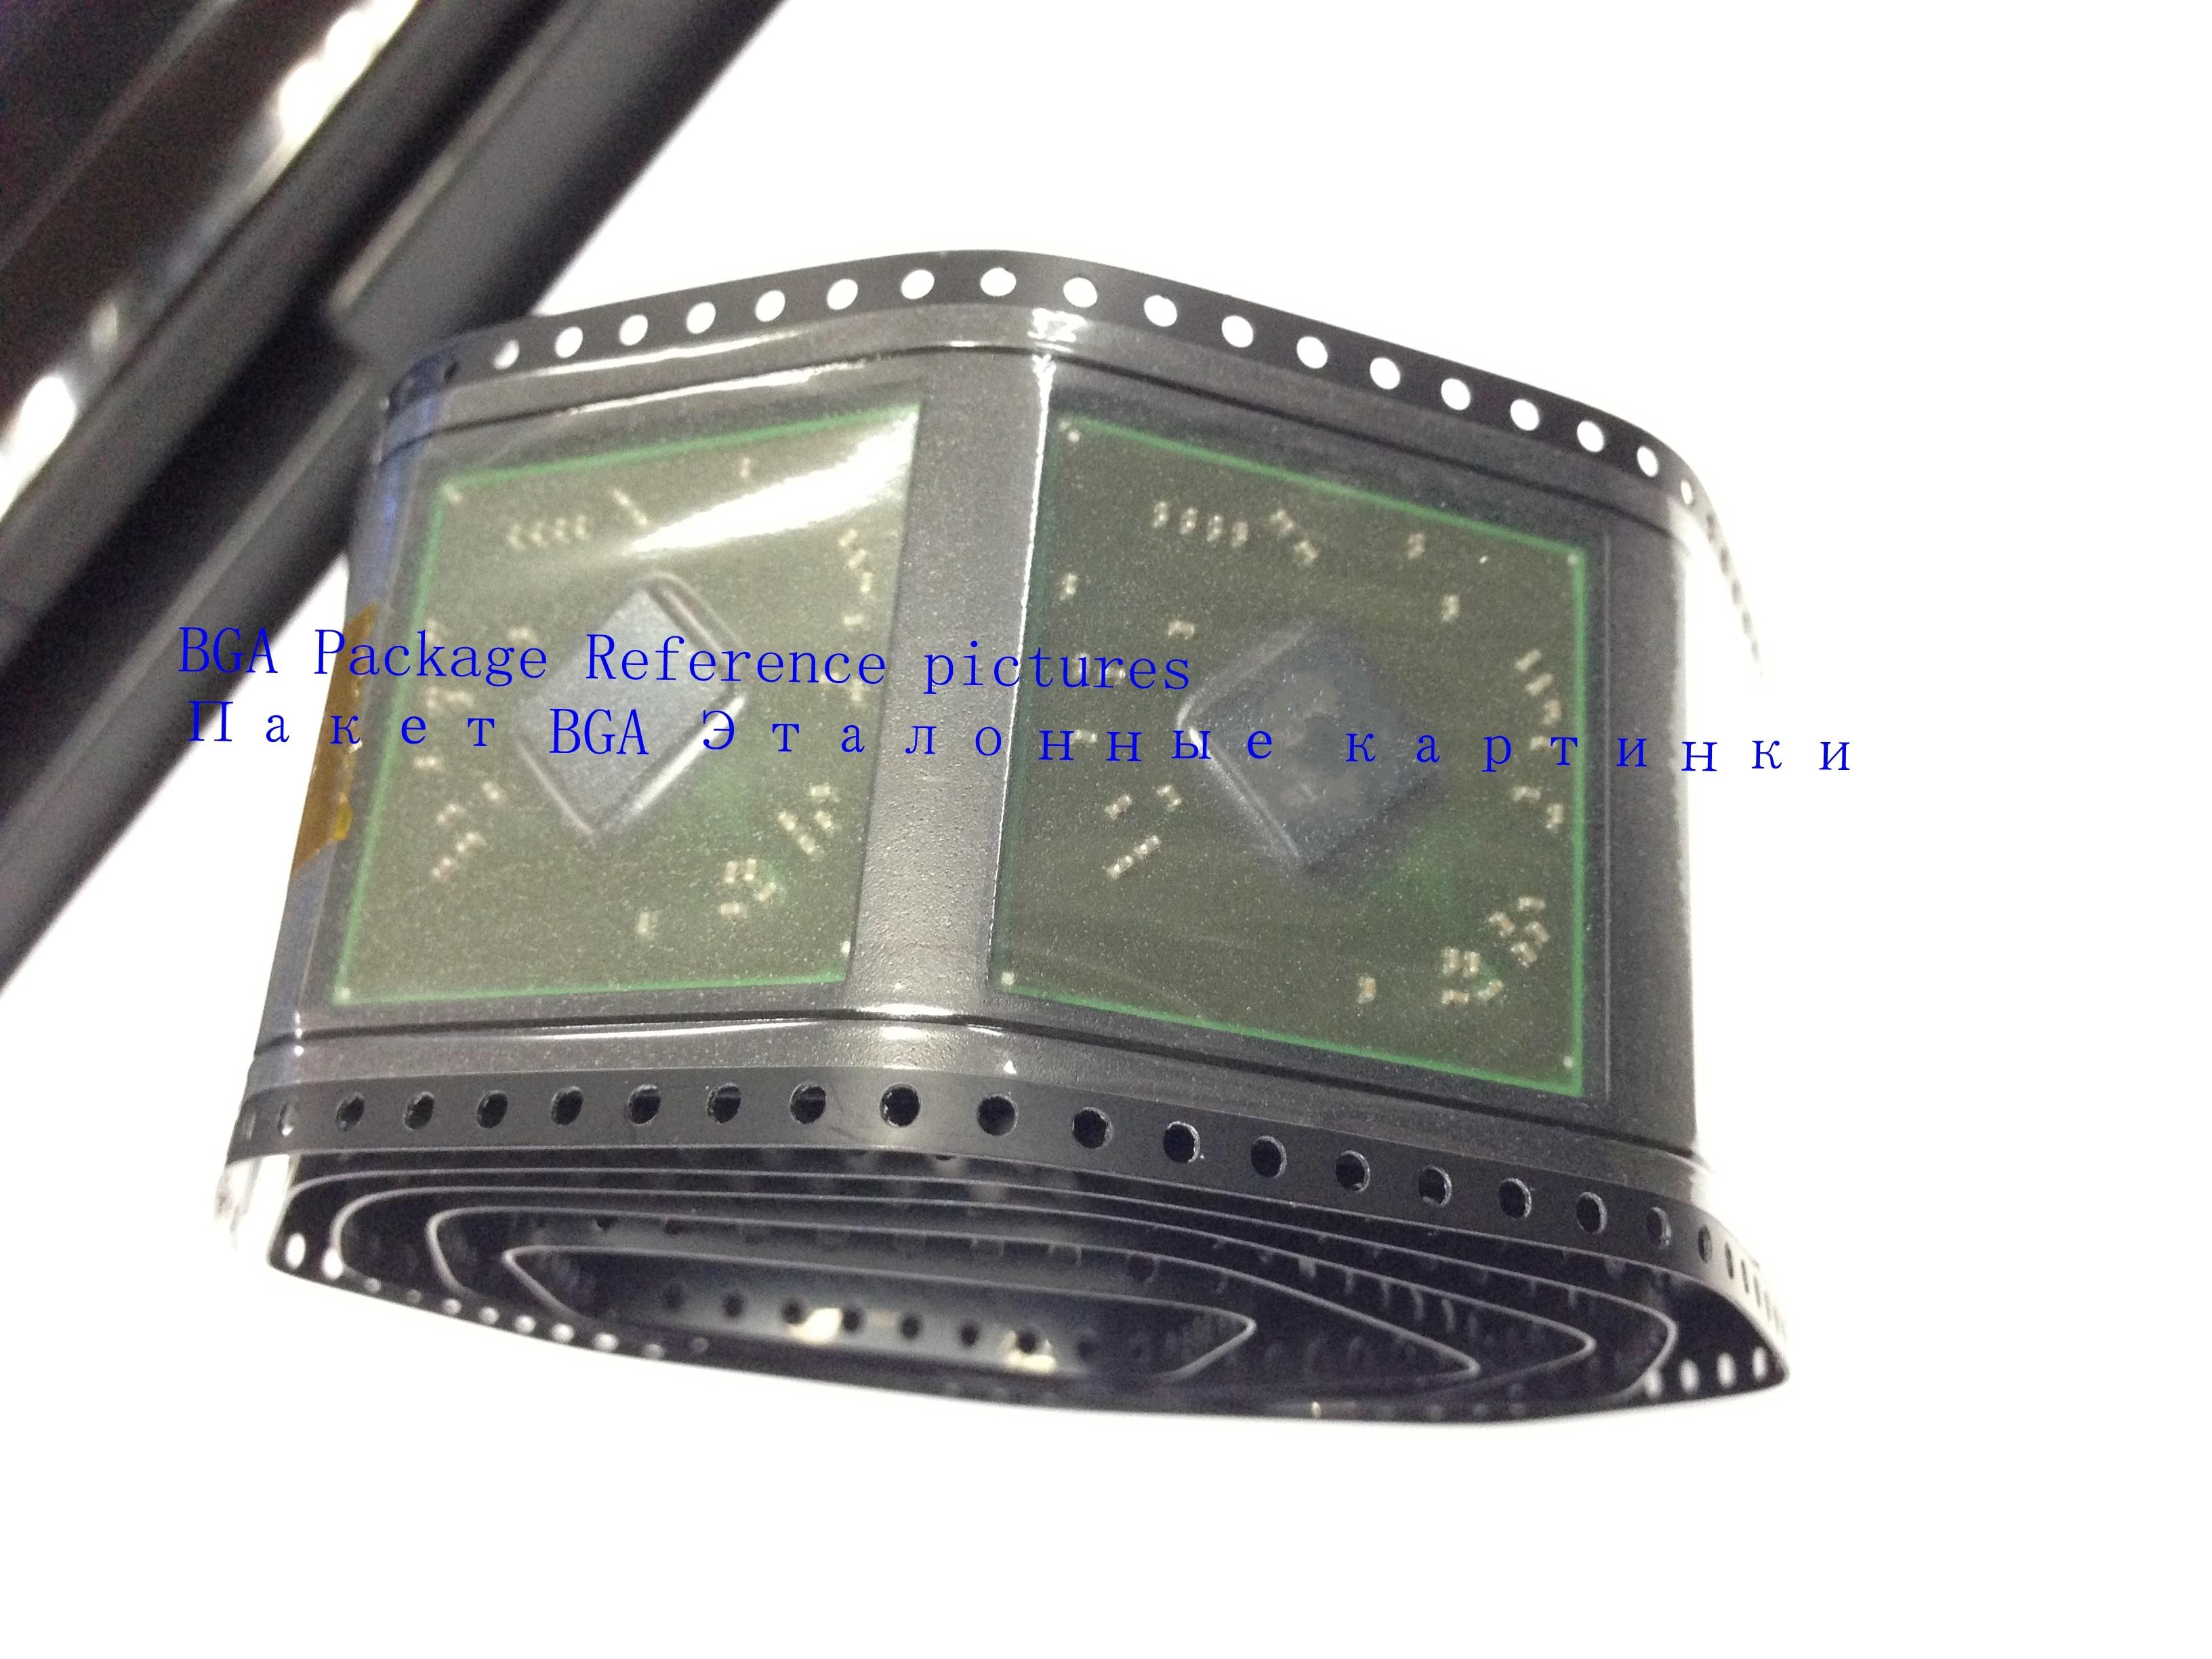 1pcs/lot 100% New SR29Z Z8300 BGA Chipset1pcs/lot 100% New SR29Z Z8300 BGA Chipset